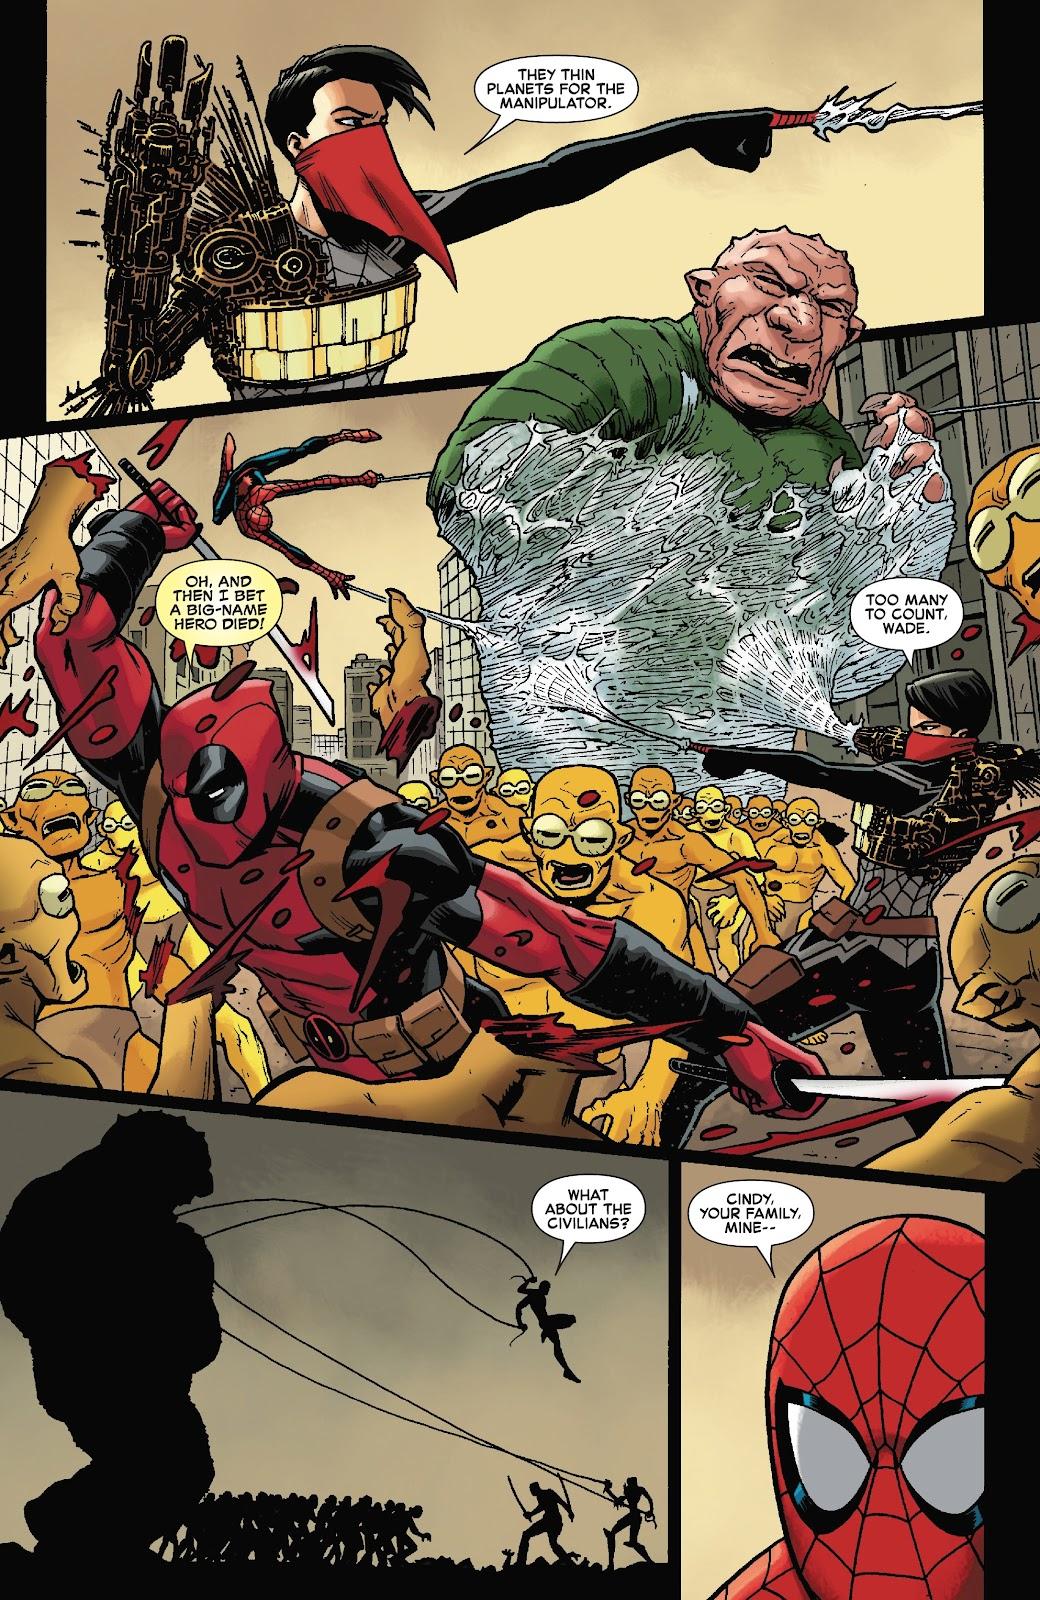 Read online Spider-Man/Deadpool comic -  Issue #46 - 17